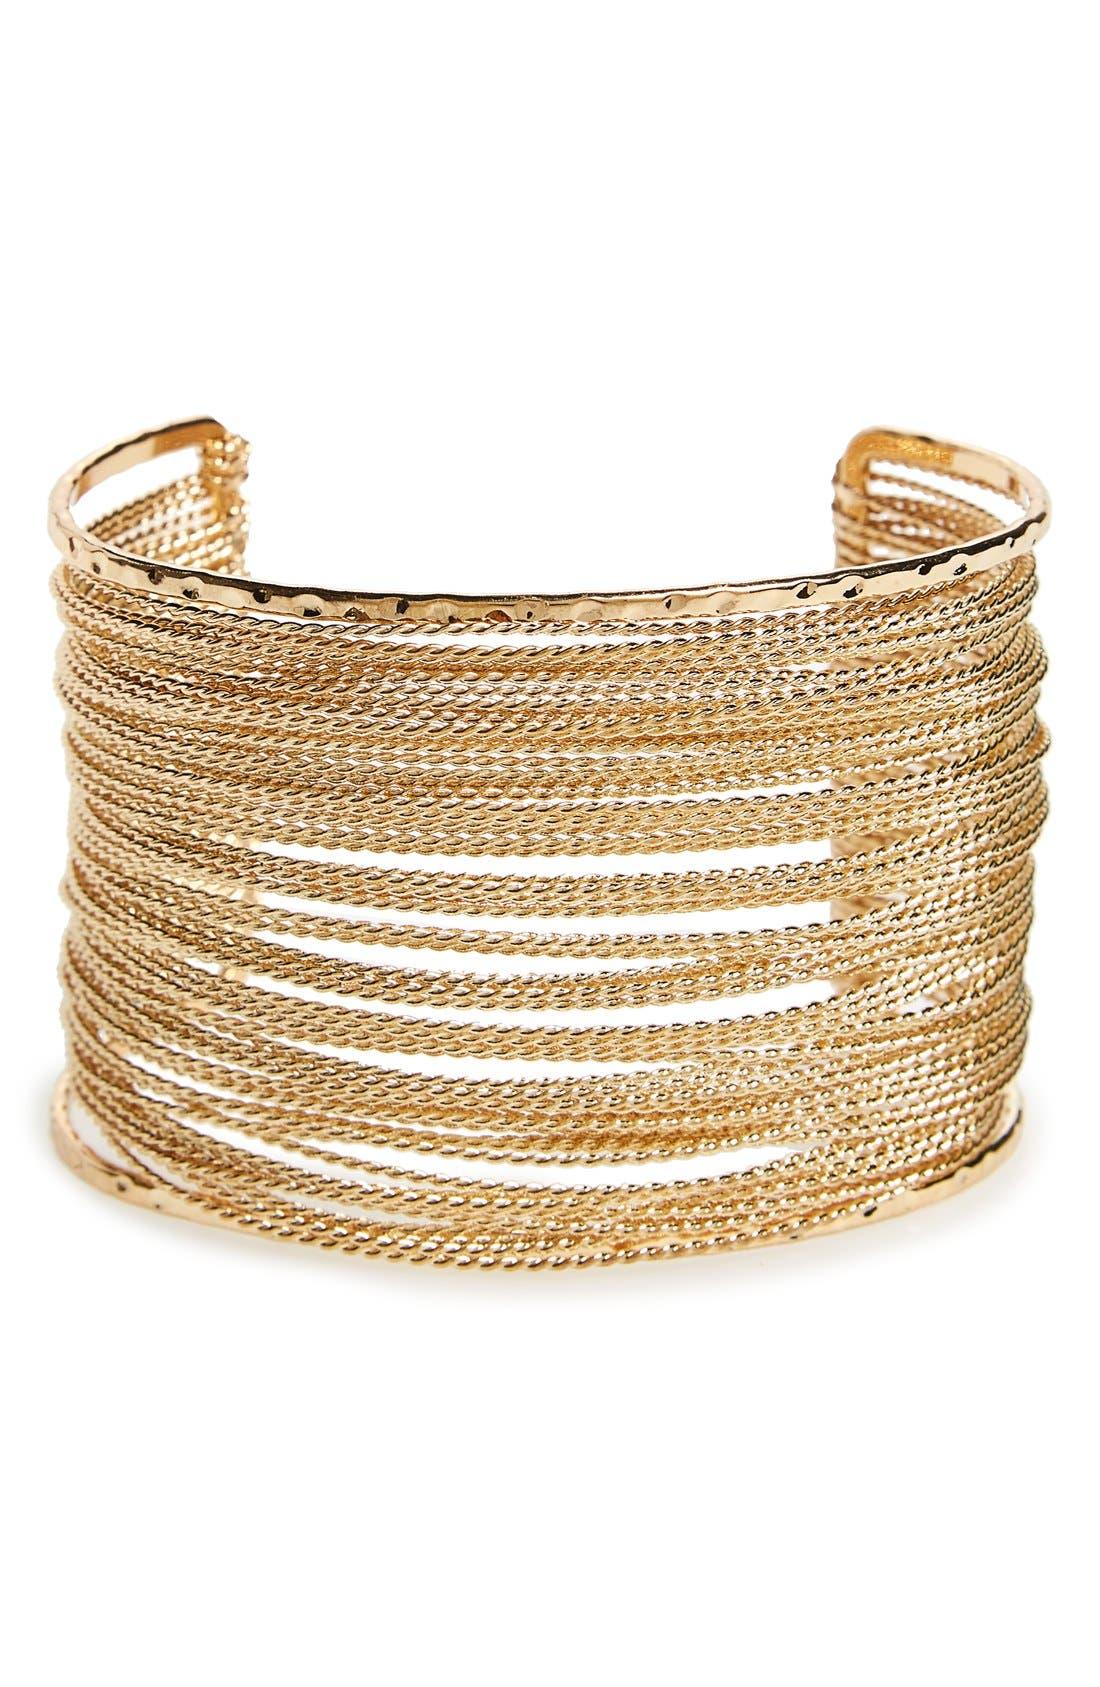 Alternate Image 1 Selected - Panacea Chain Cuff